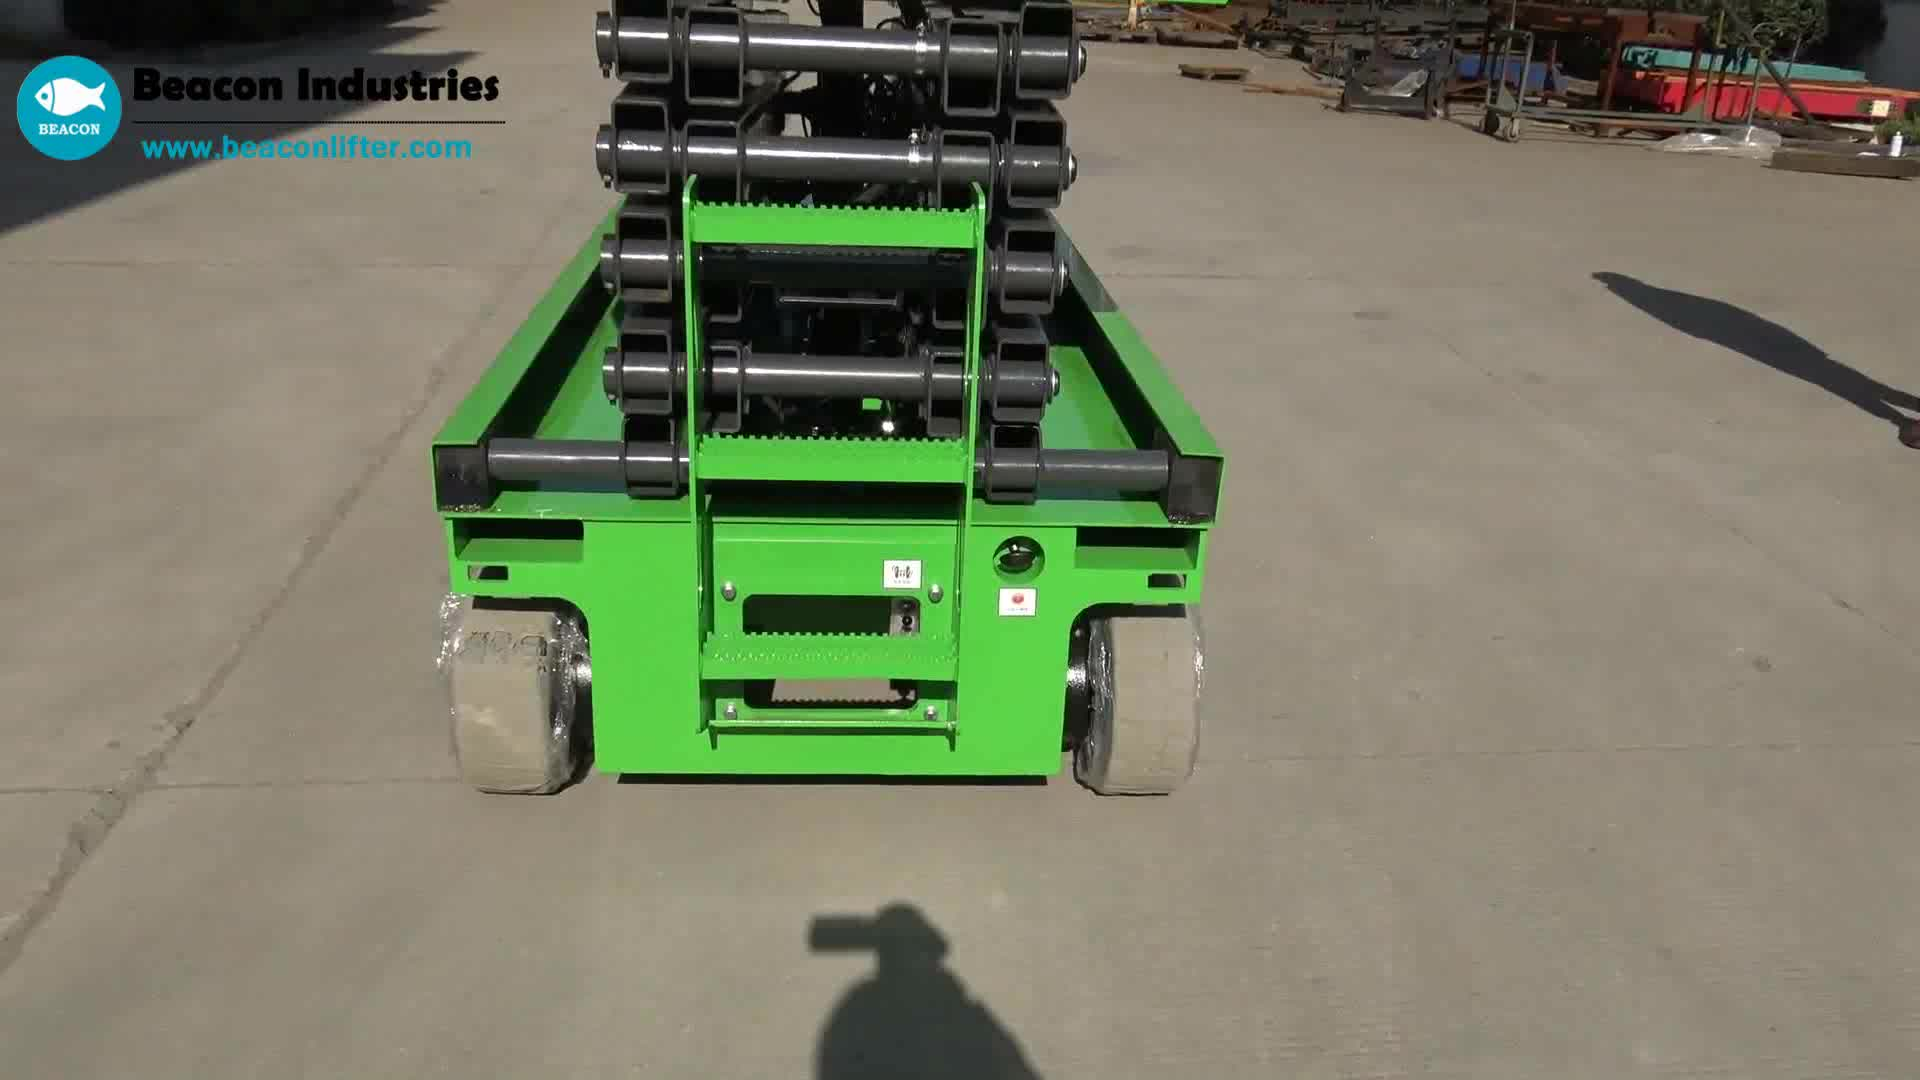 10m material lifting platform motorized lifting platform scissor lift platform